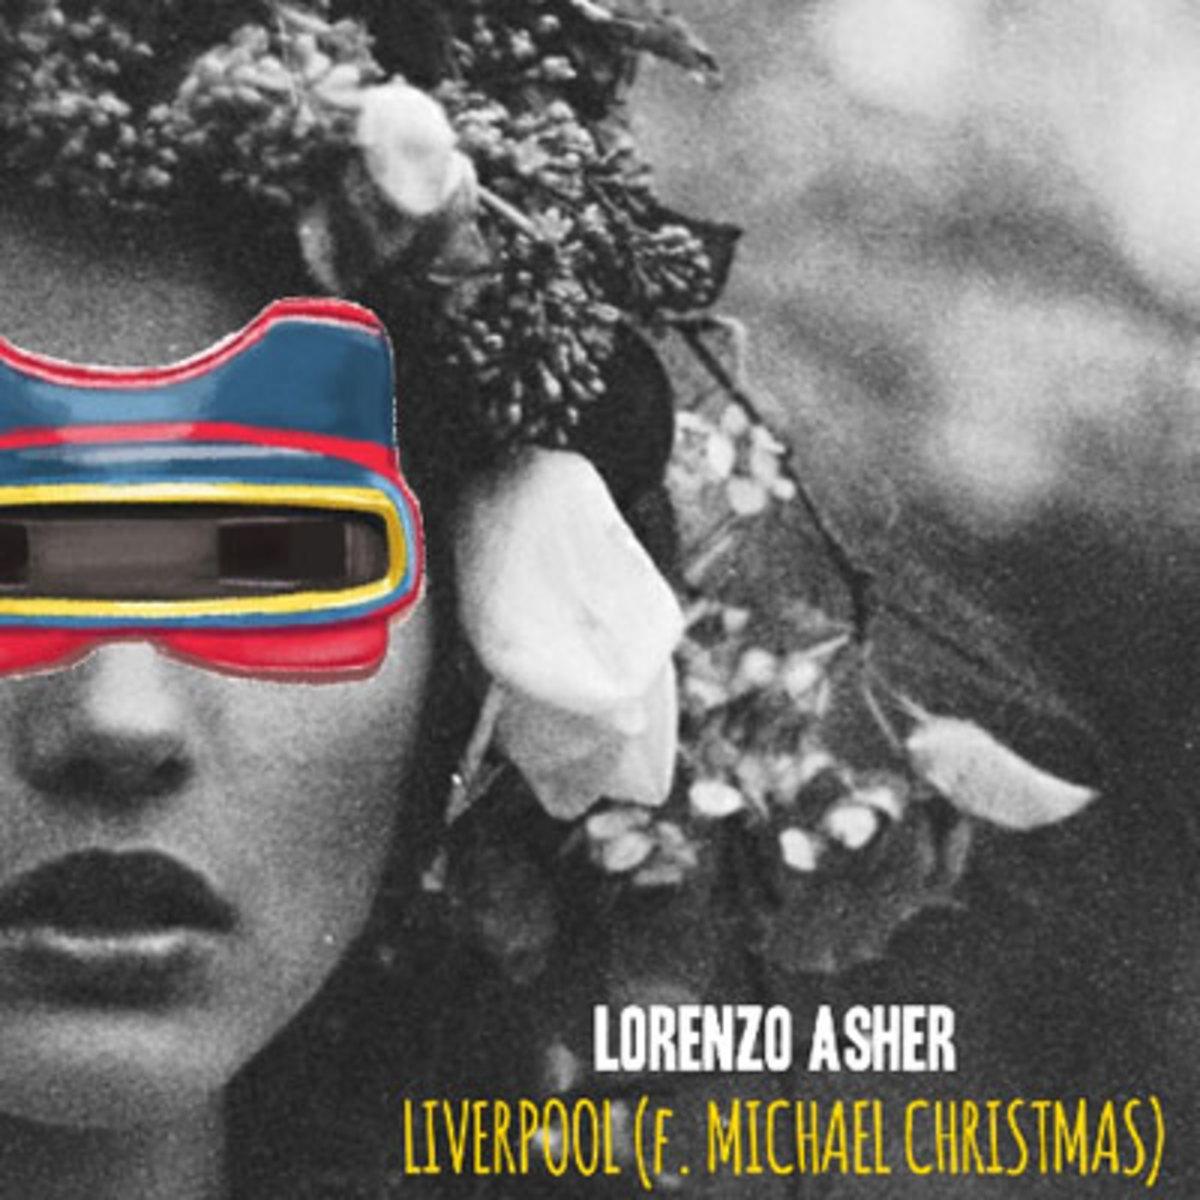 lorenzo-asher-liverpool.jpg